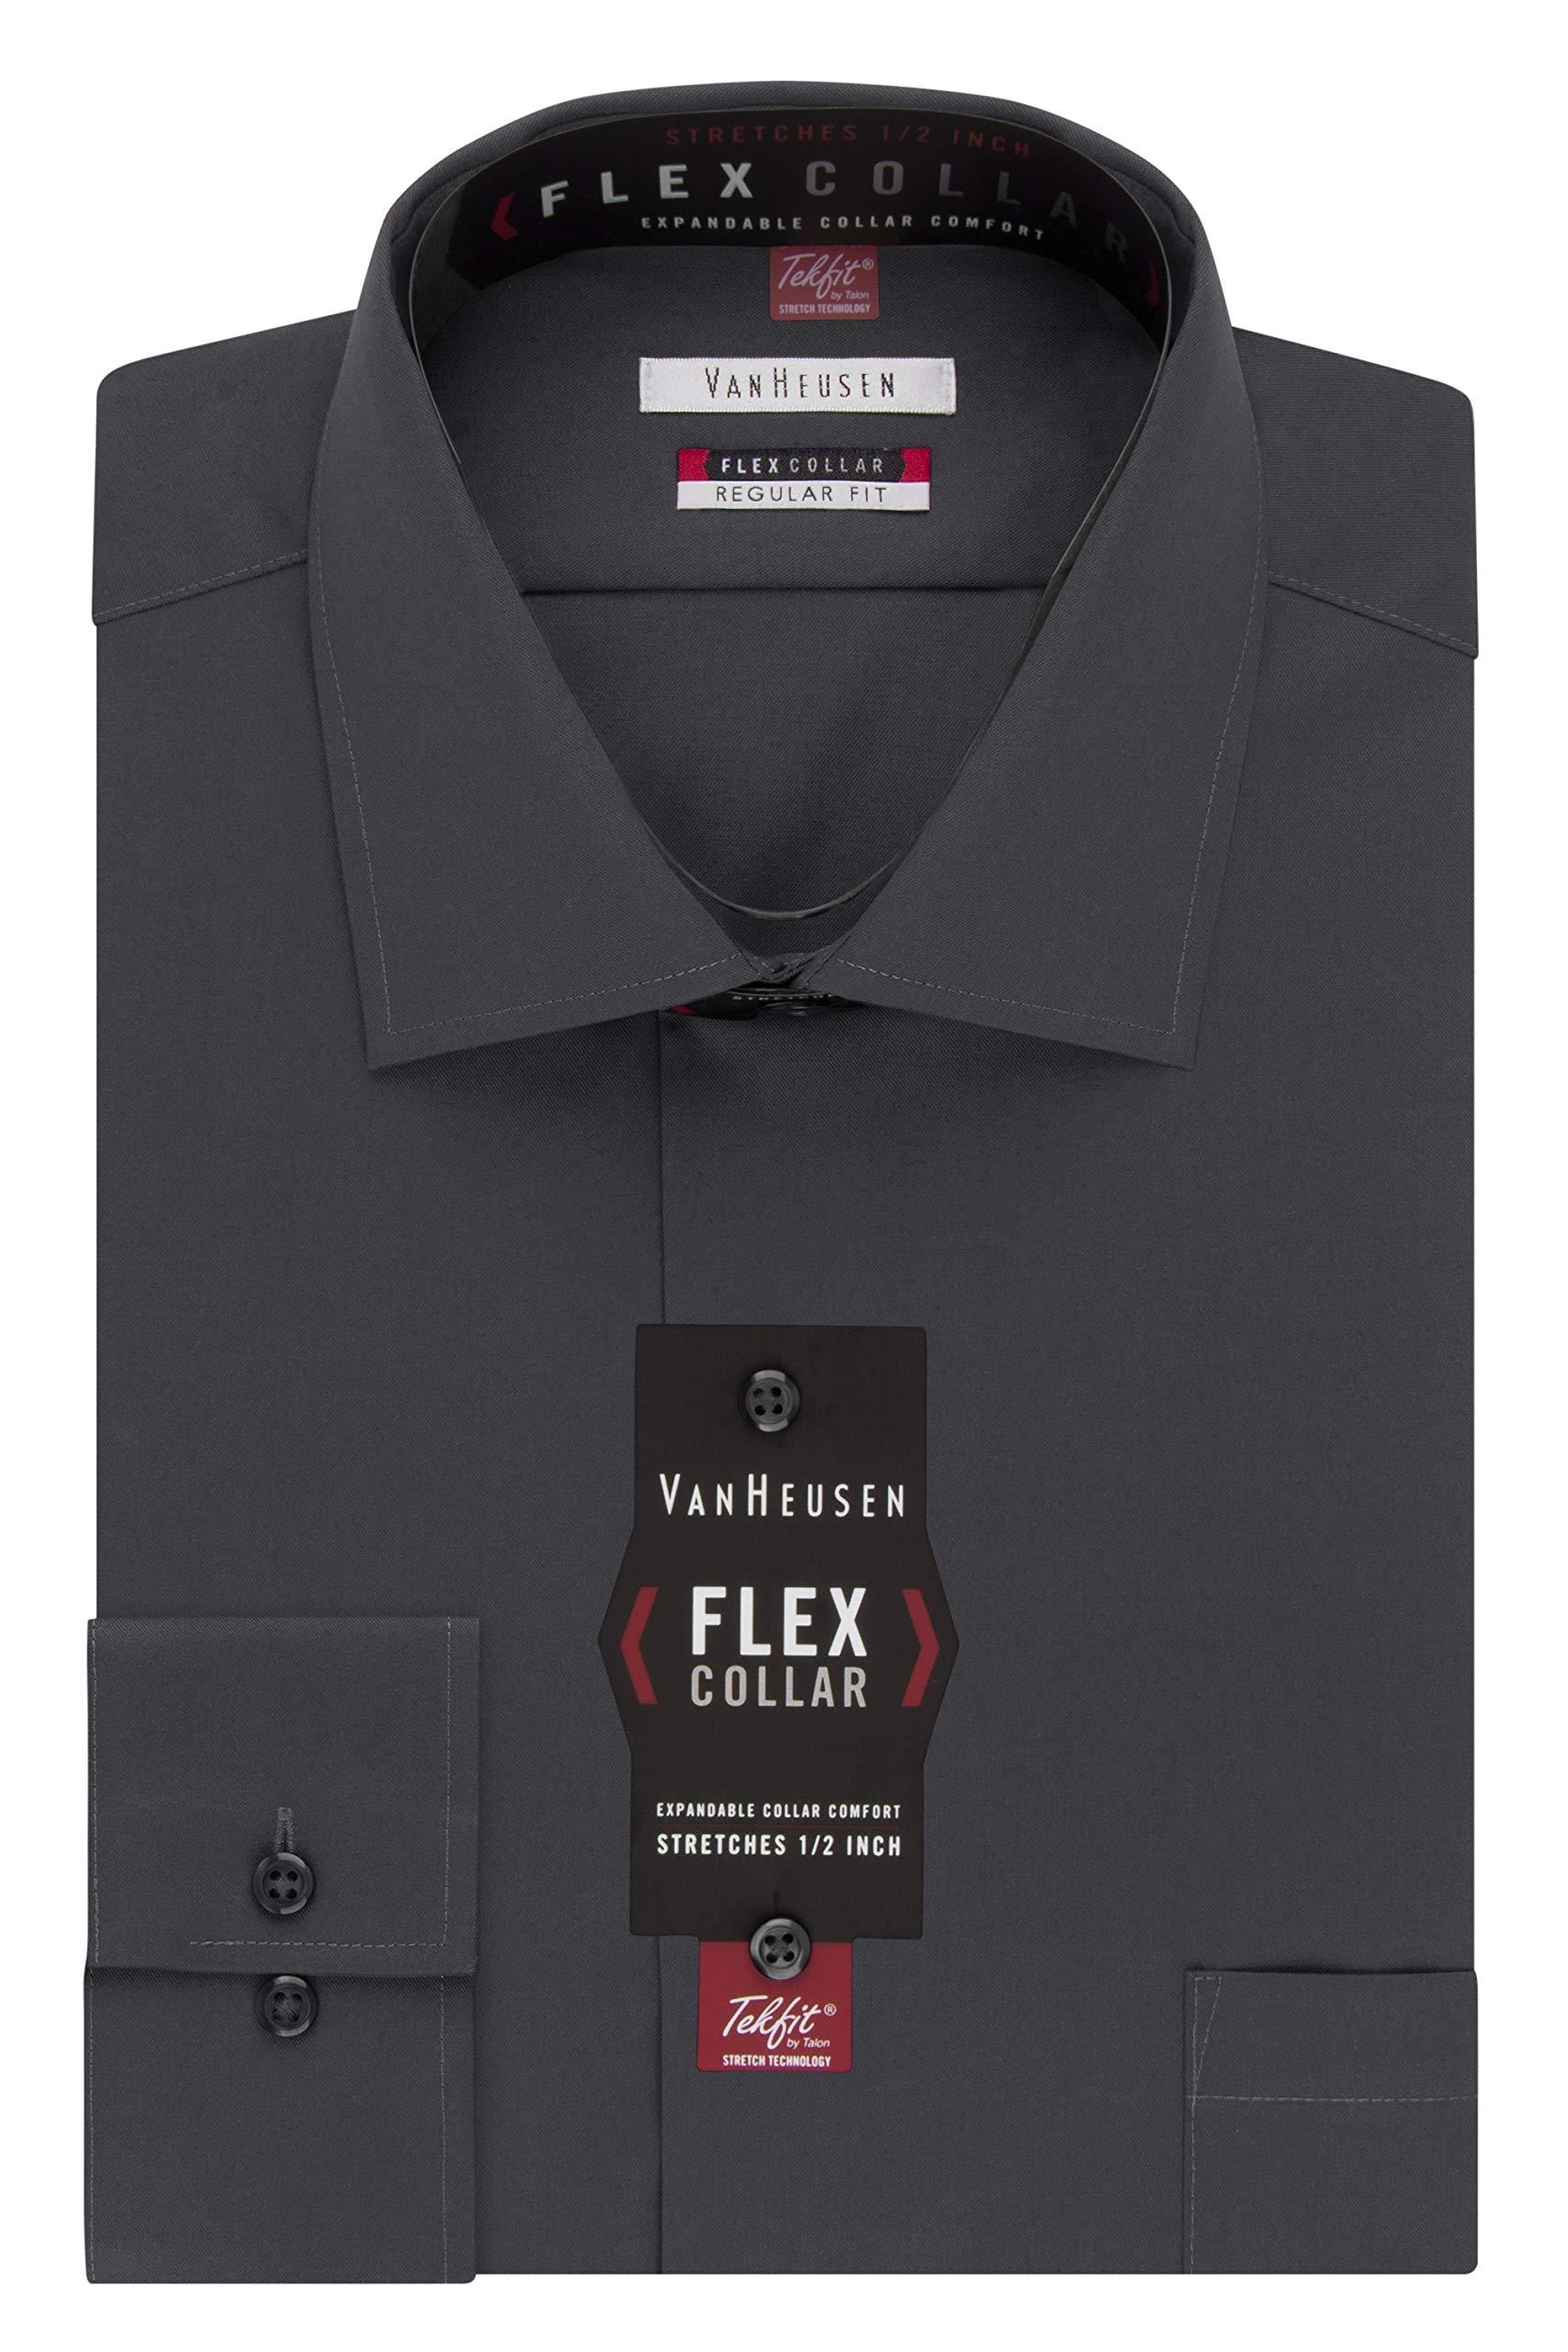 Van Heusen Men's Big and Tall Dress Shirt Regular Fit Flex Collar Solid, Charcoal, 18.5'' Neck 34''-35'' Sleeve